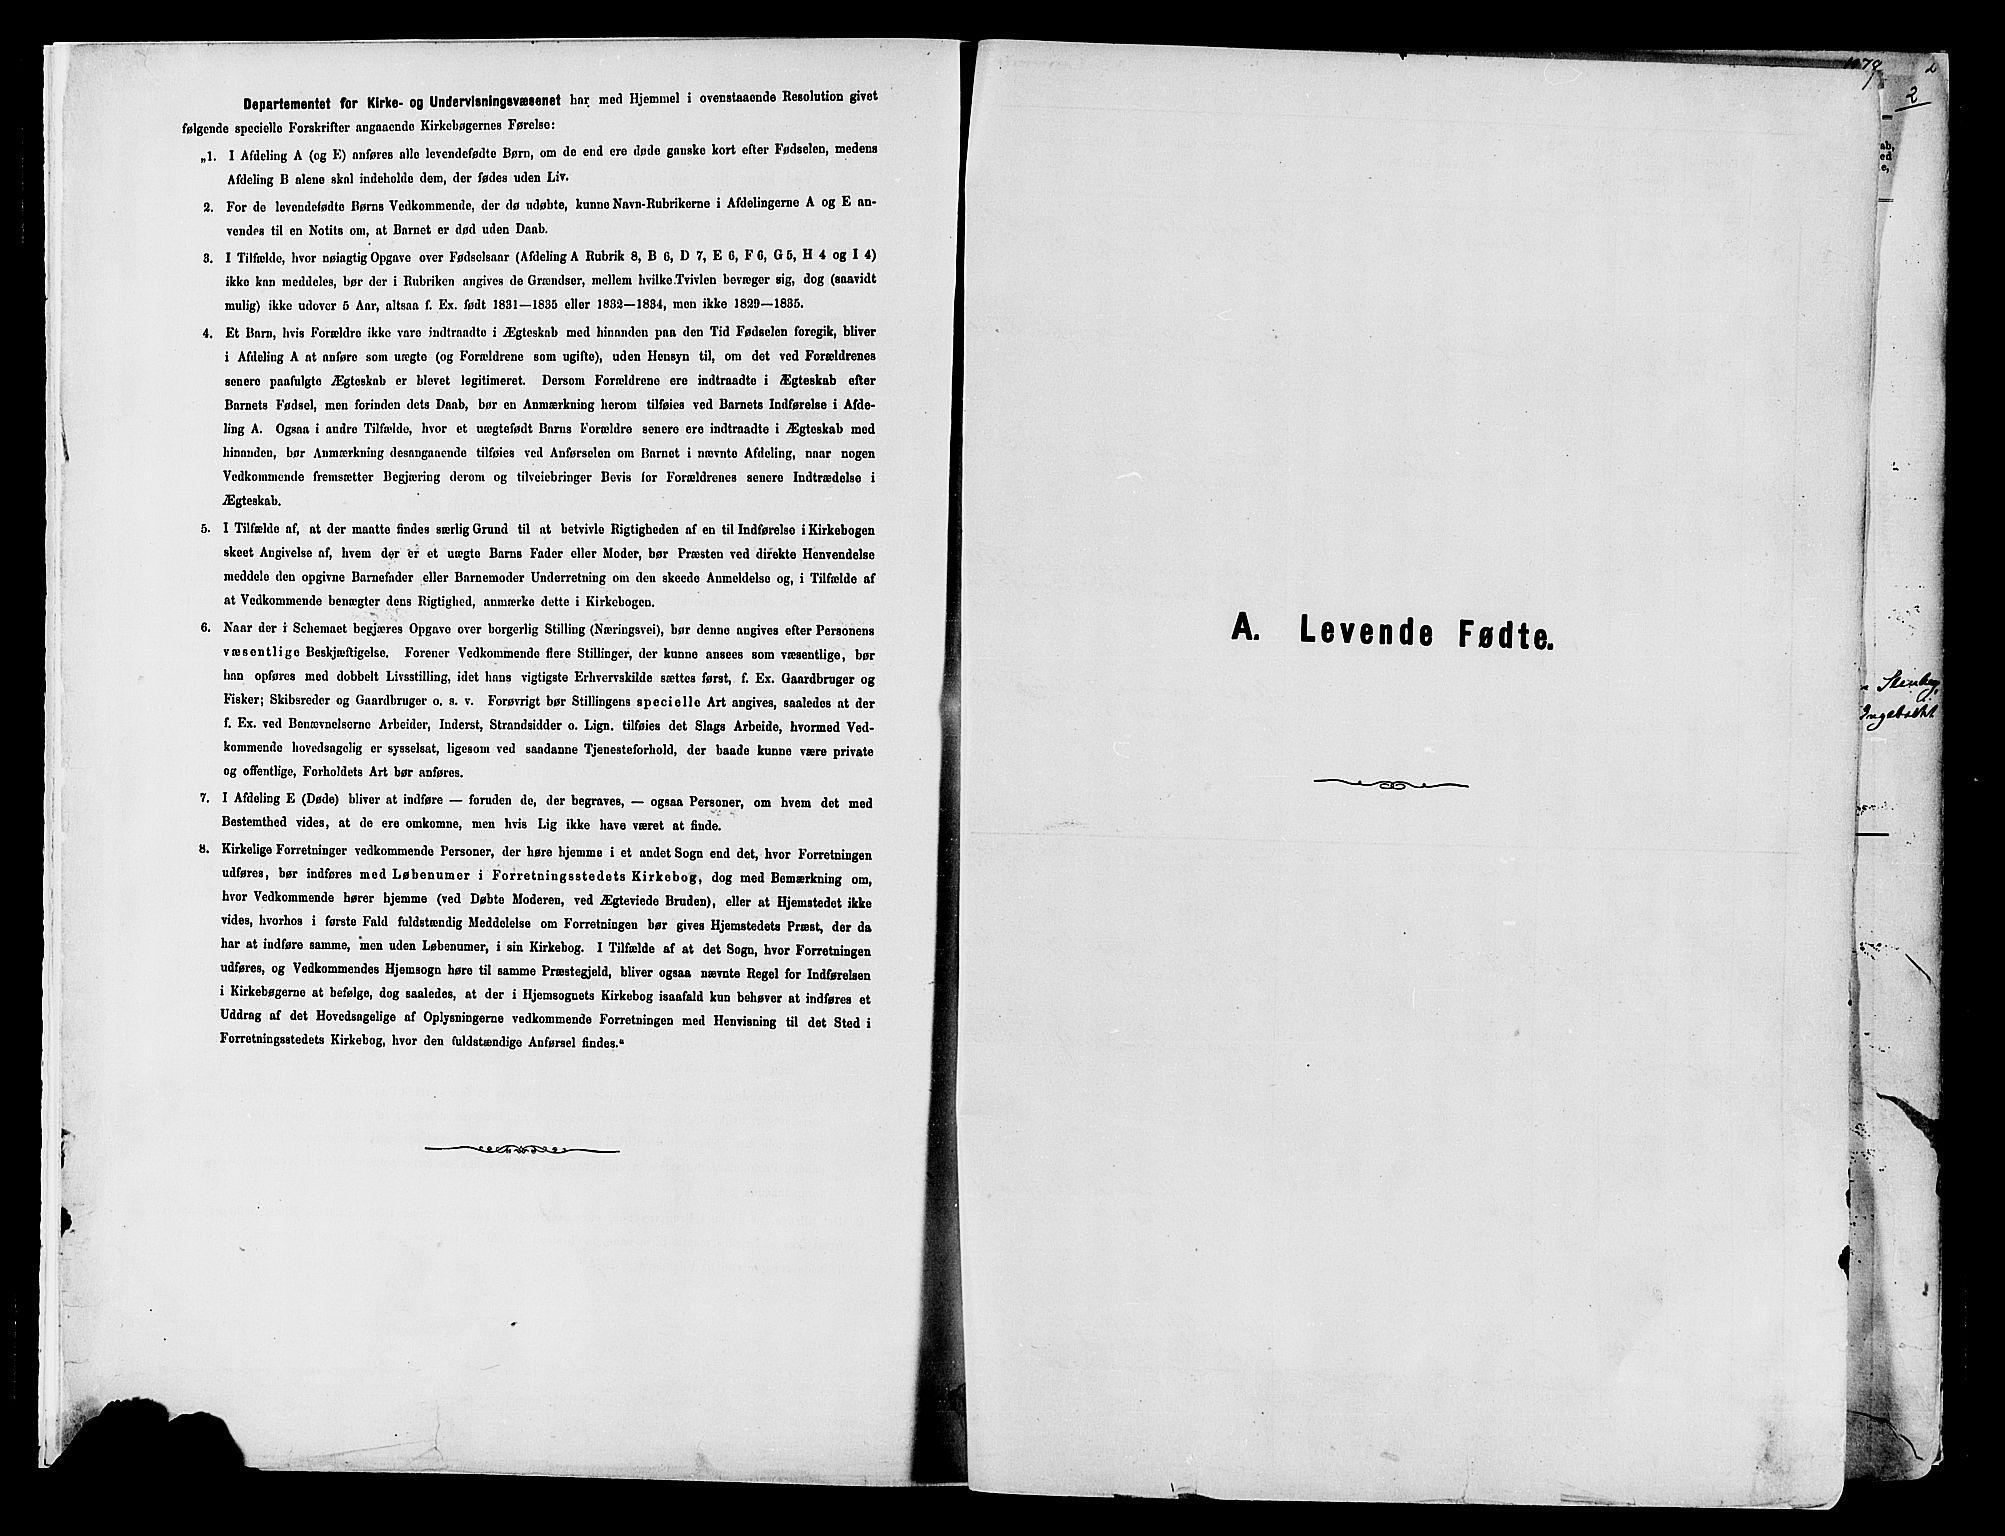 SAH, Vardal prestekontor, H/Ha/Haa/L0009: Ministerialbok nr. 9, 1878-1892, s. 1